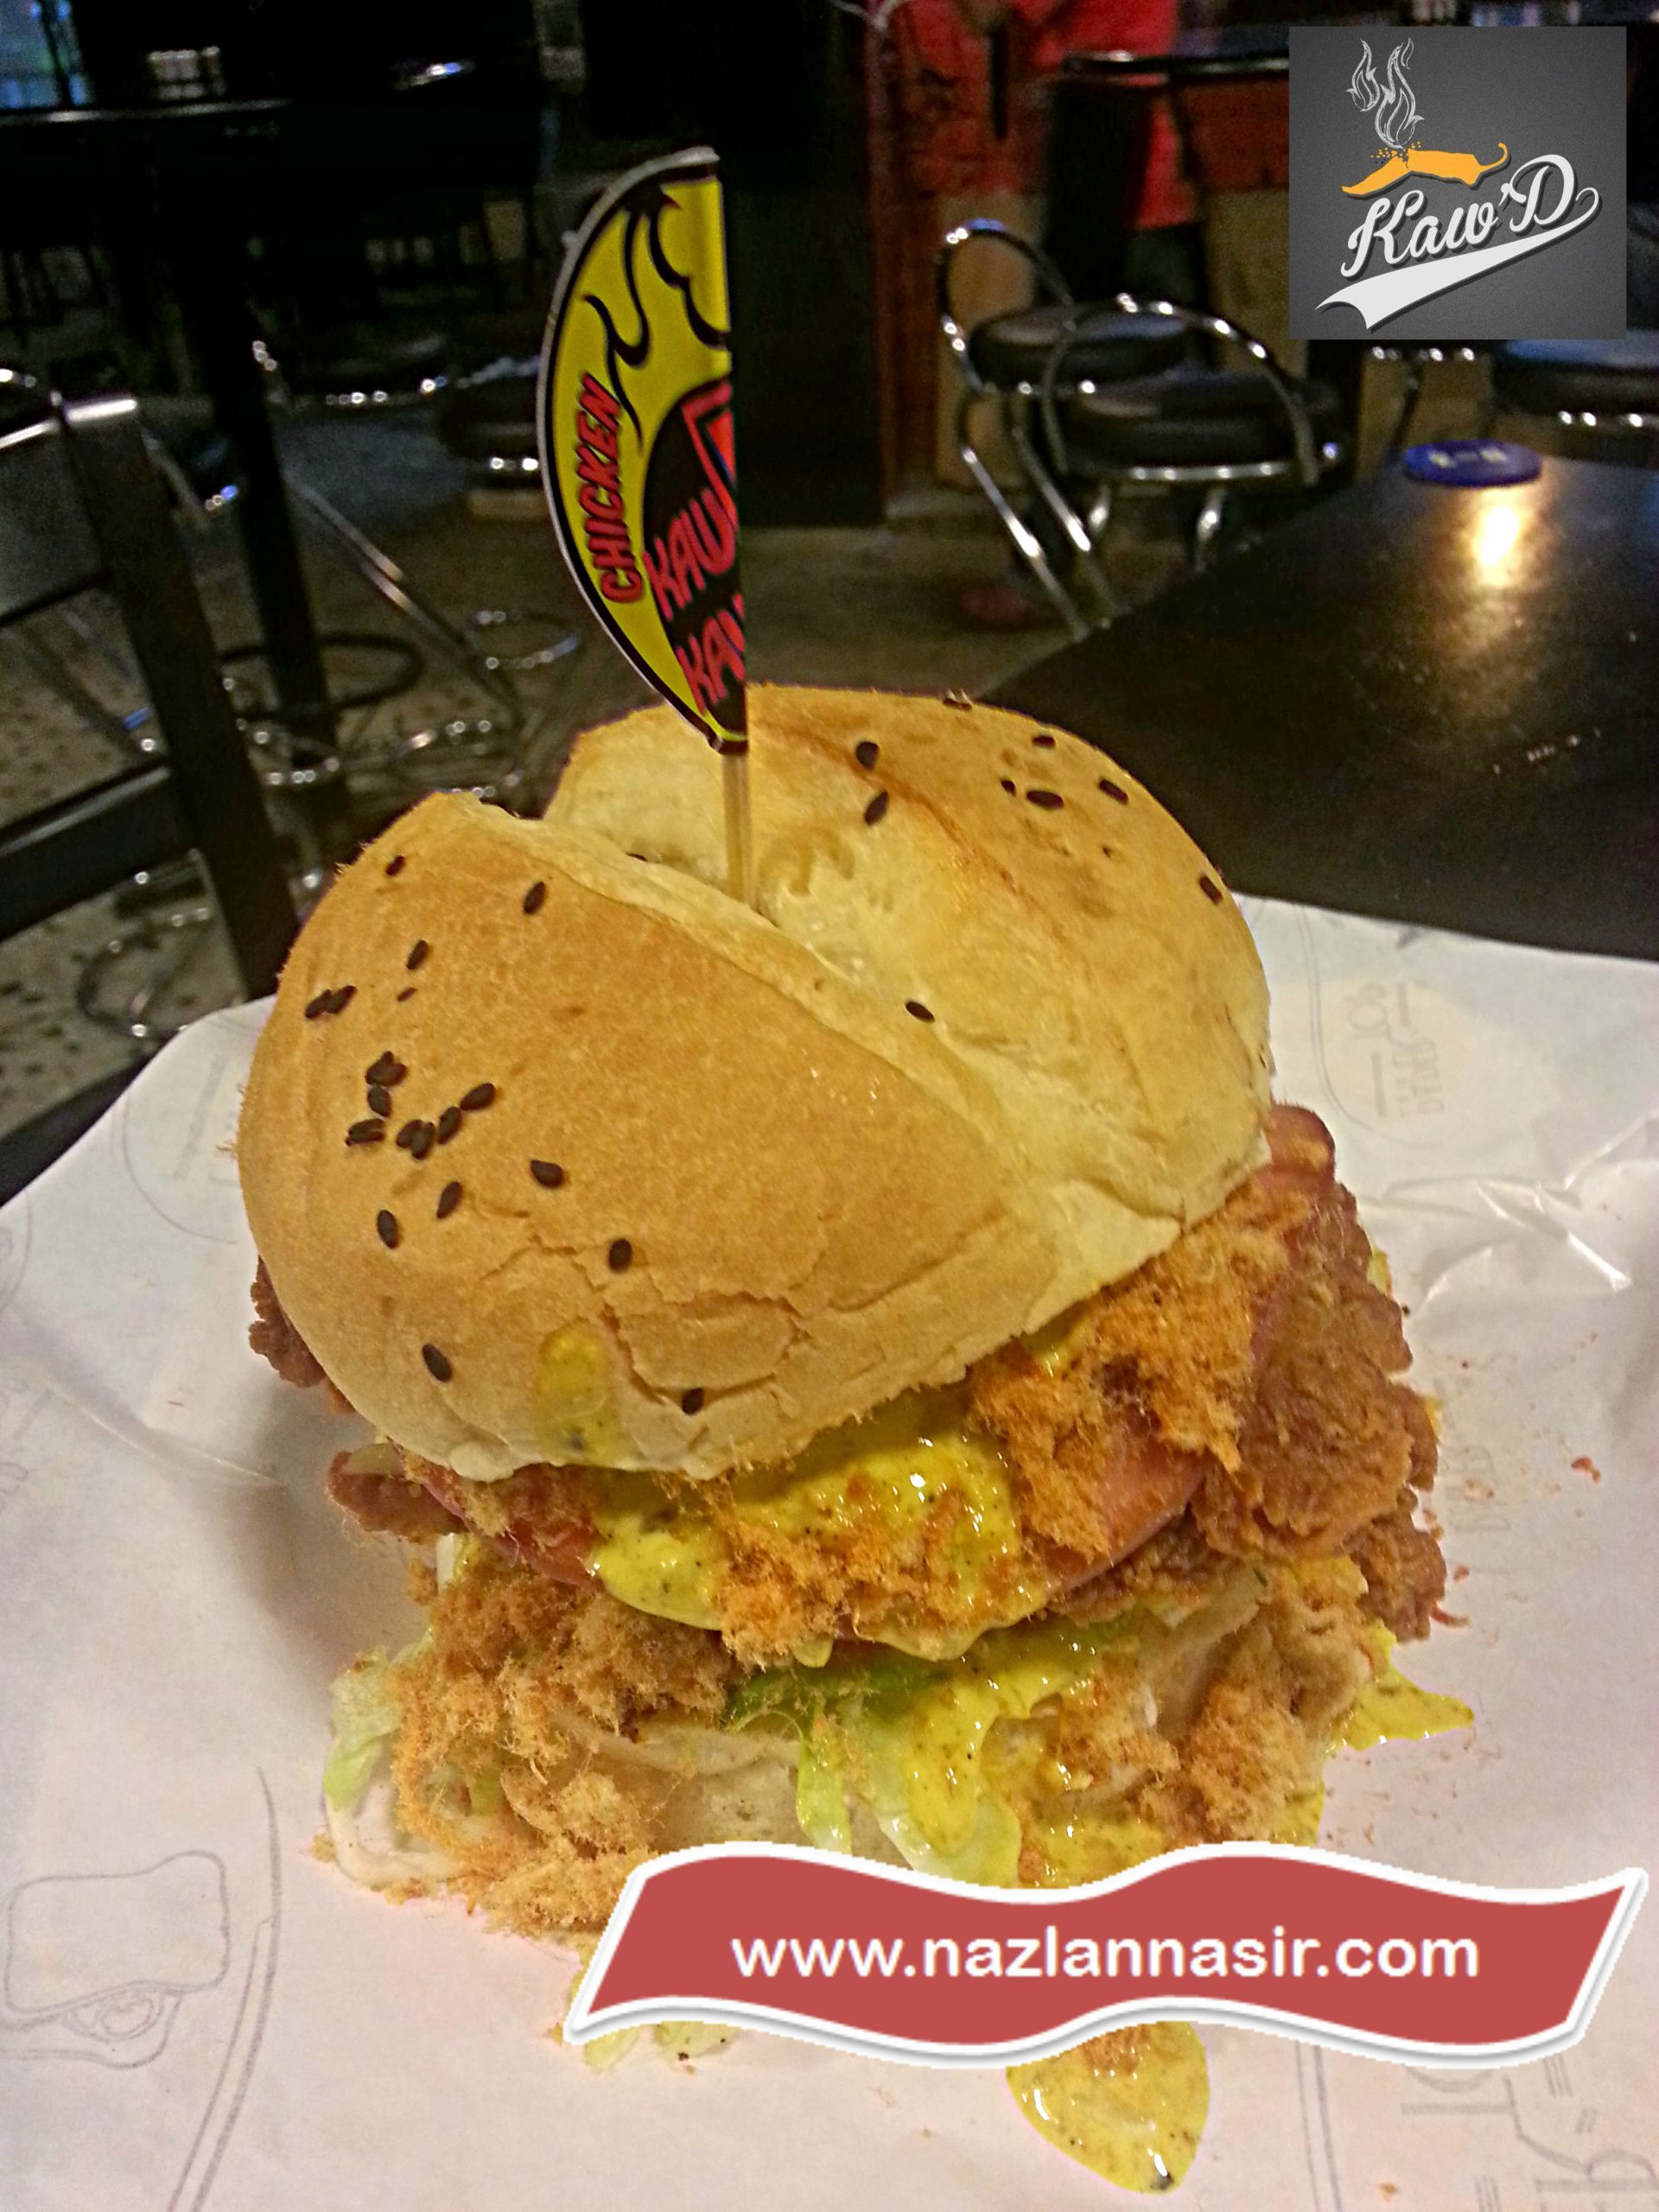 Permaisuri Crispy Chicken Burger Kaw'D